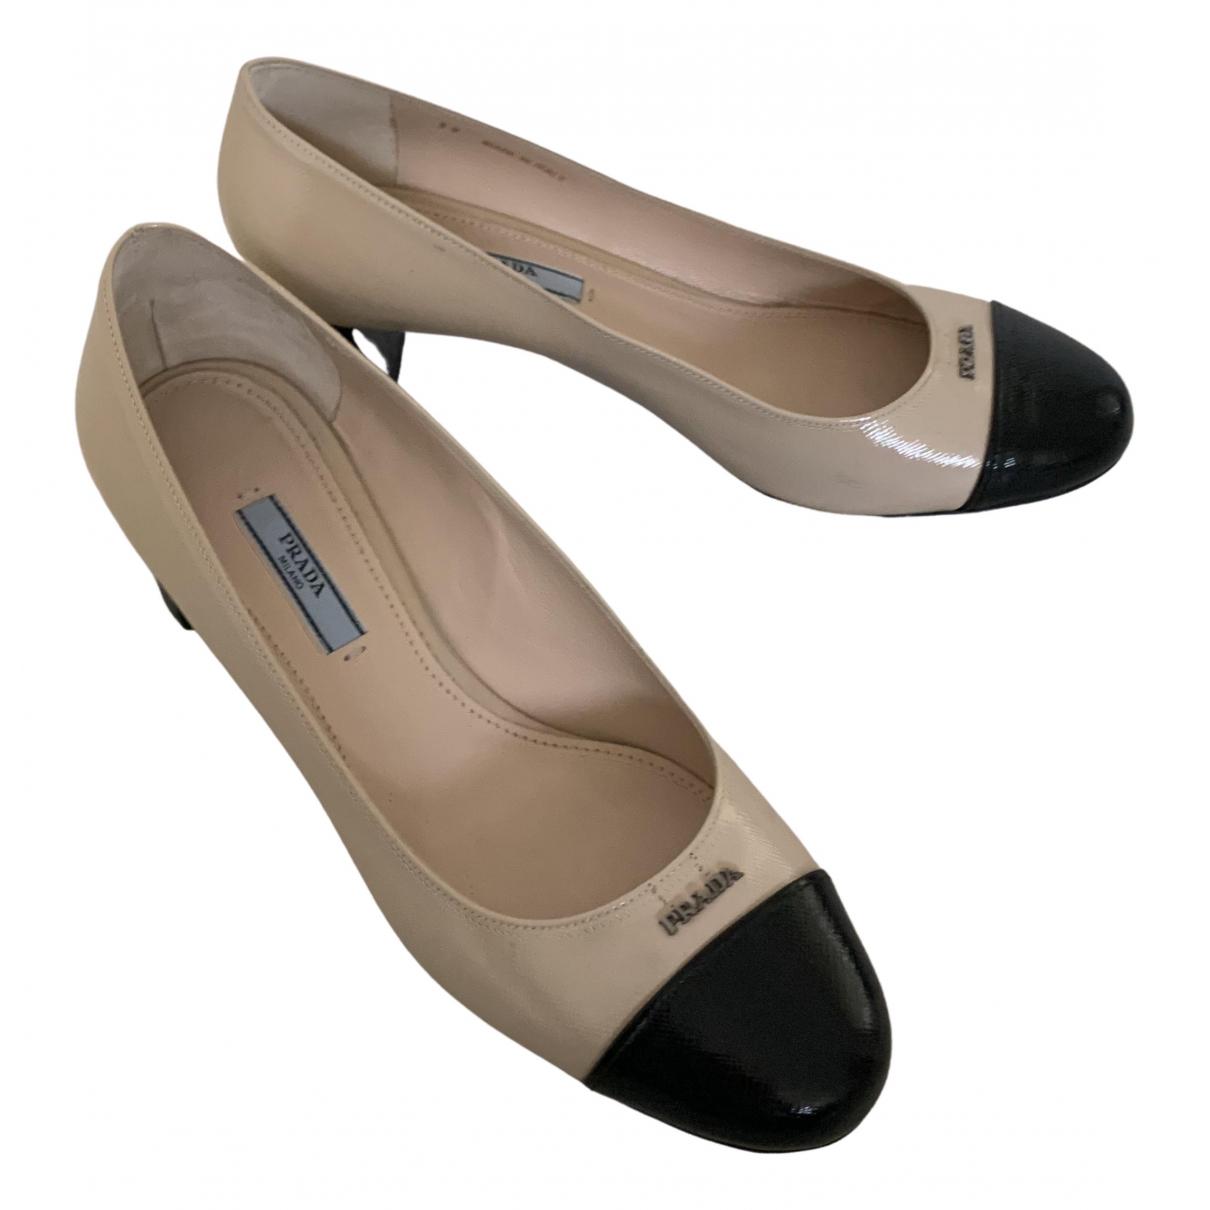 Prada N Beige Patent leather Heels for Women 39 EU